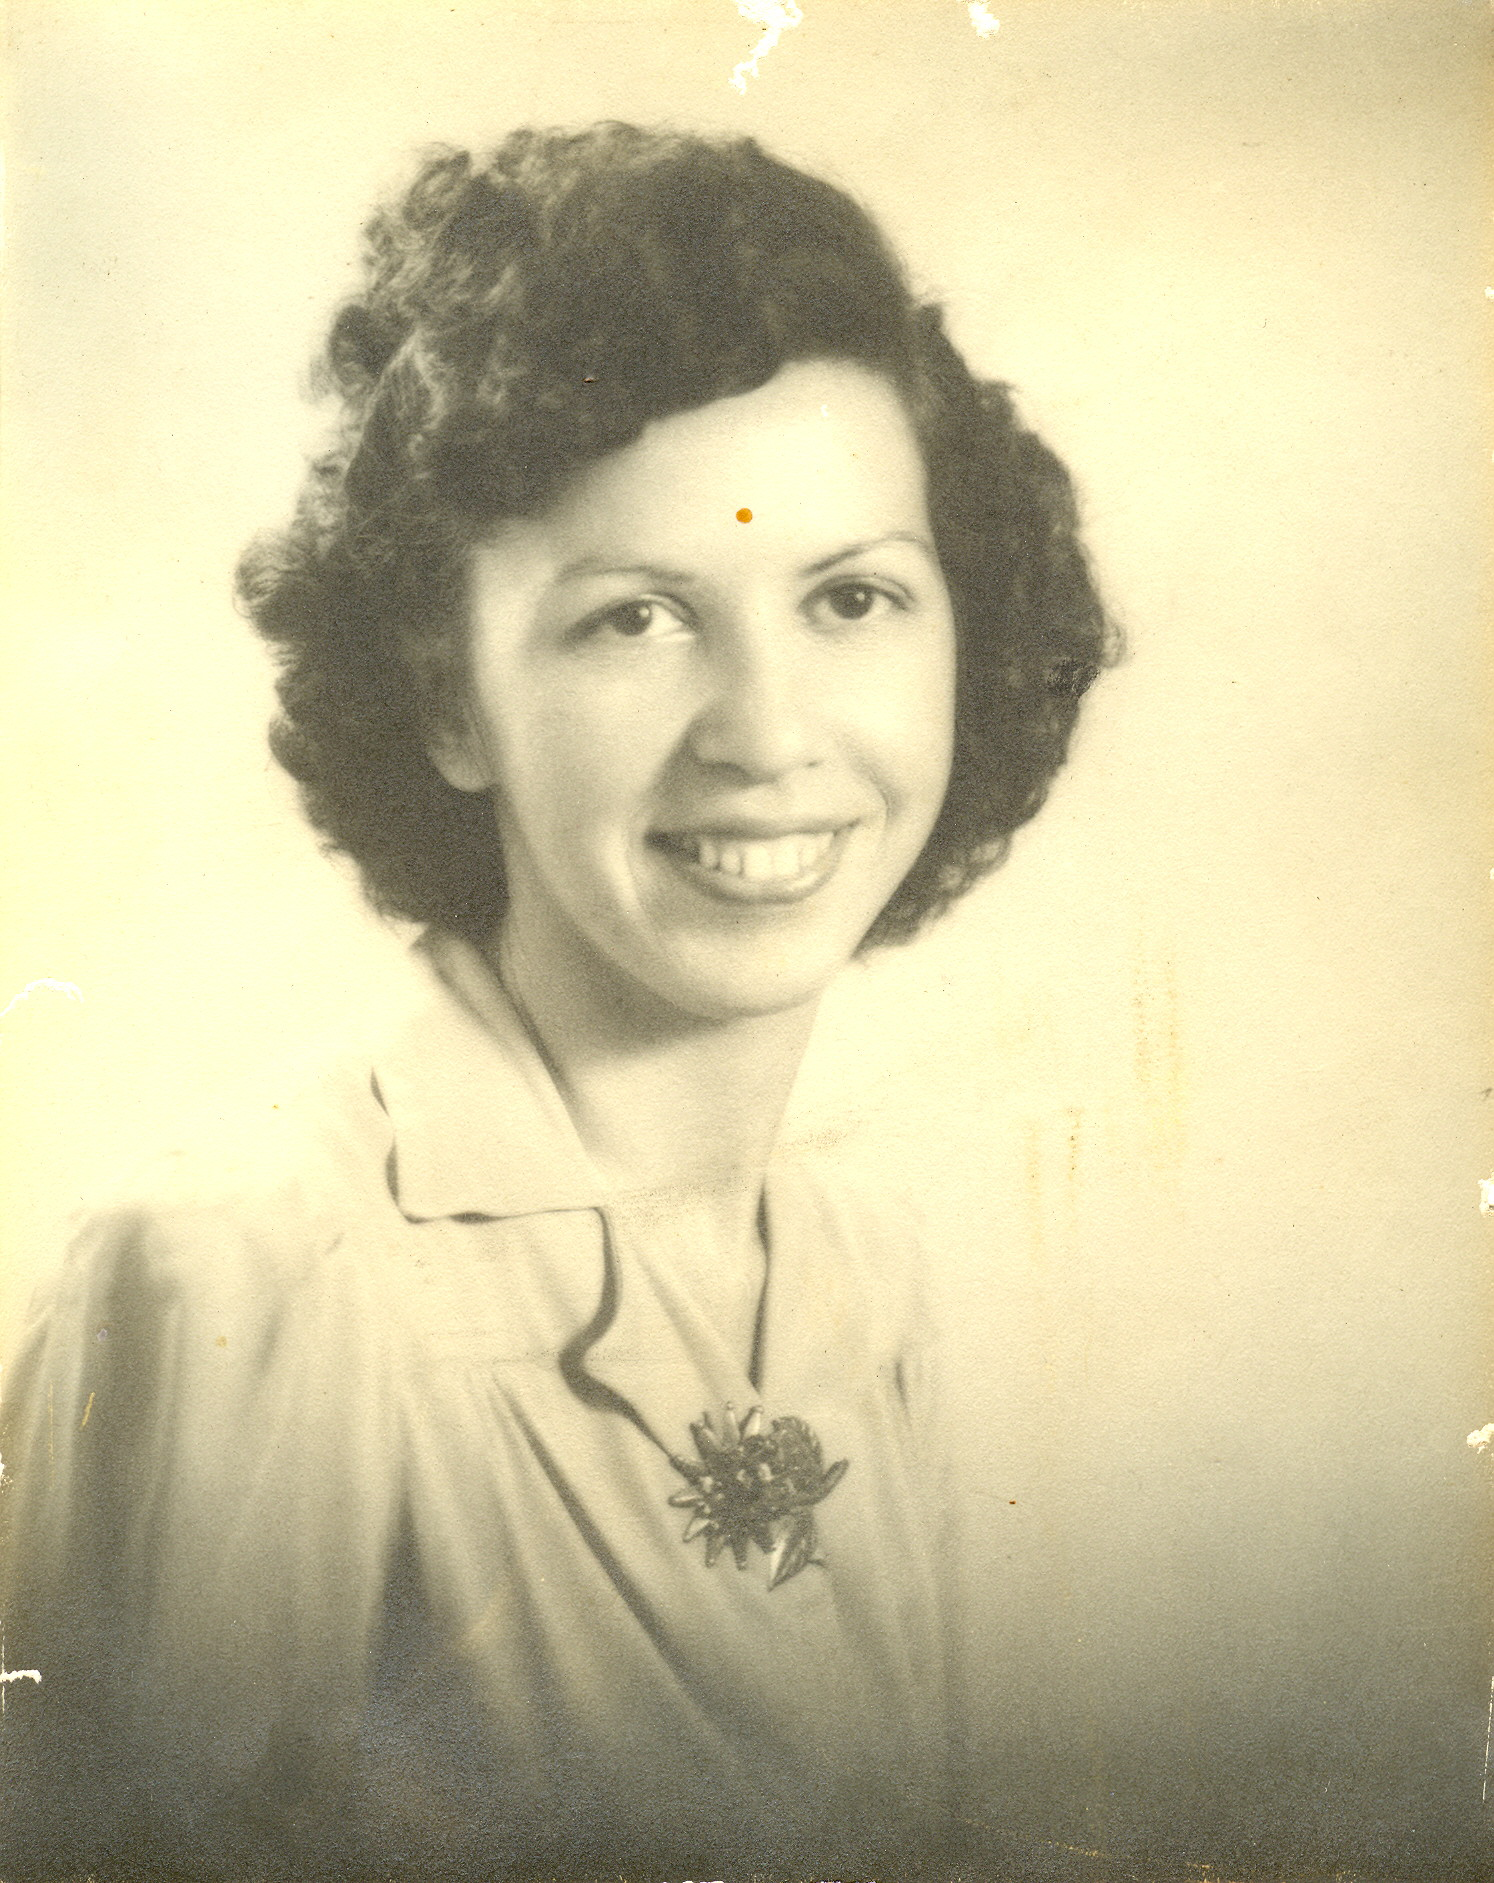 Rose Marie Cardona